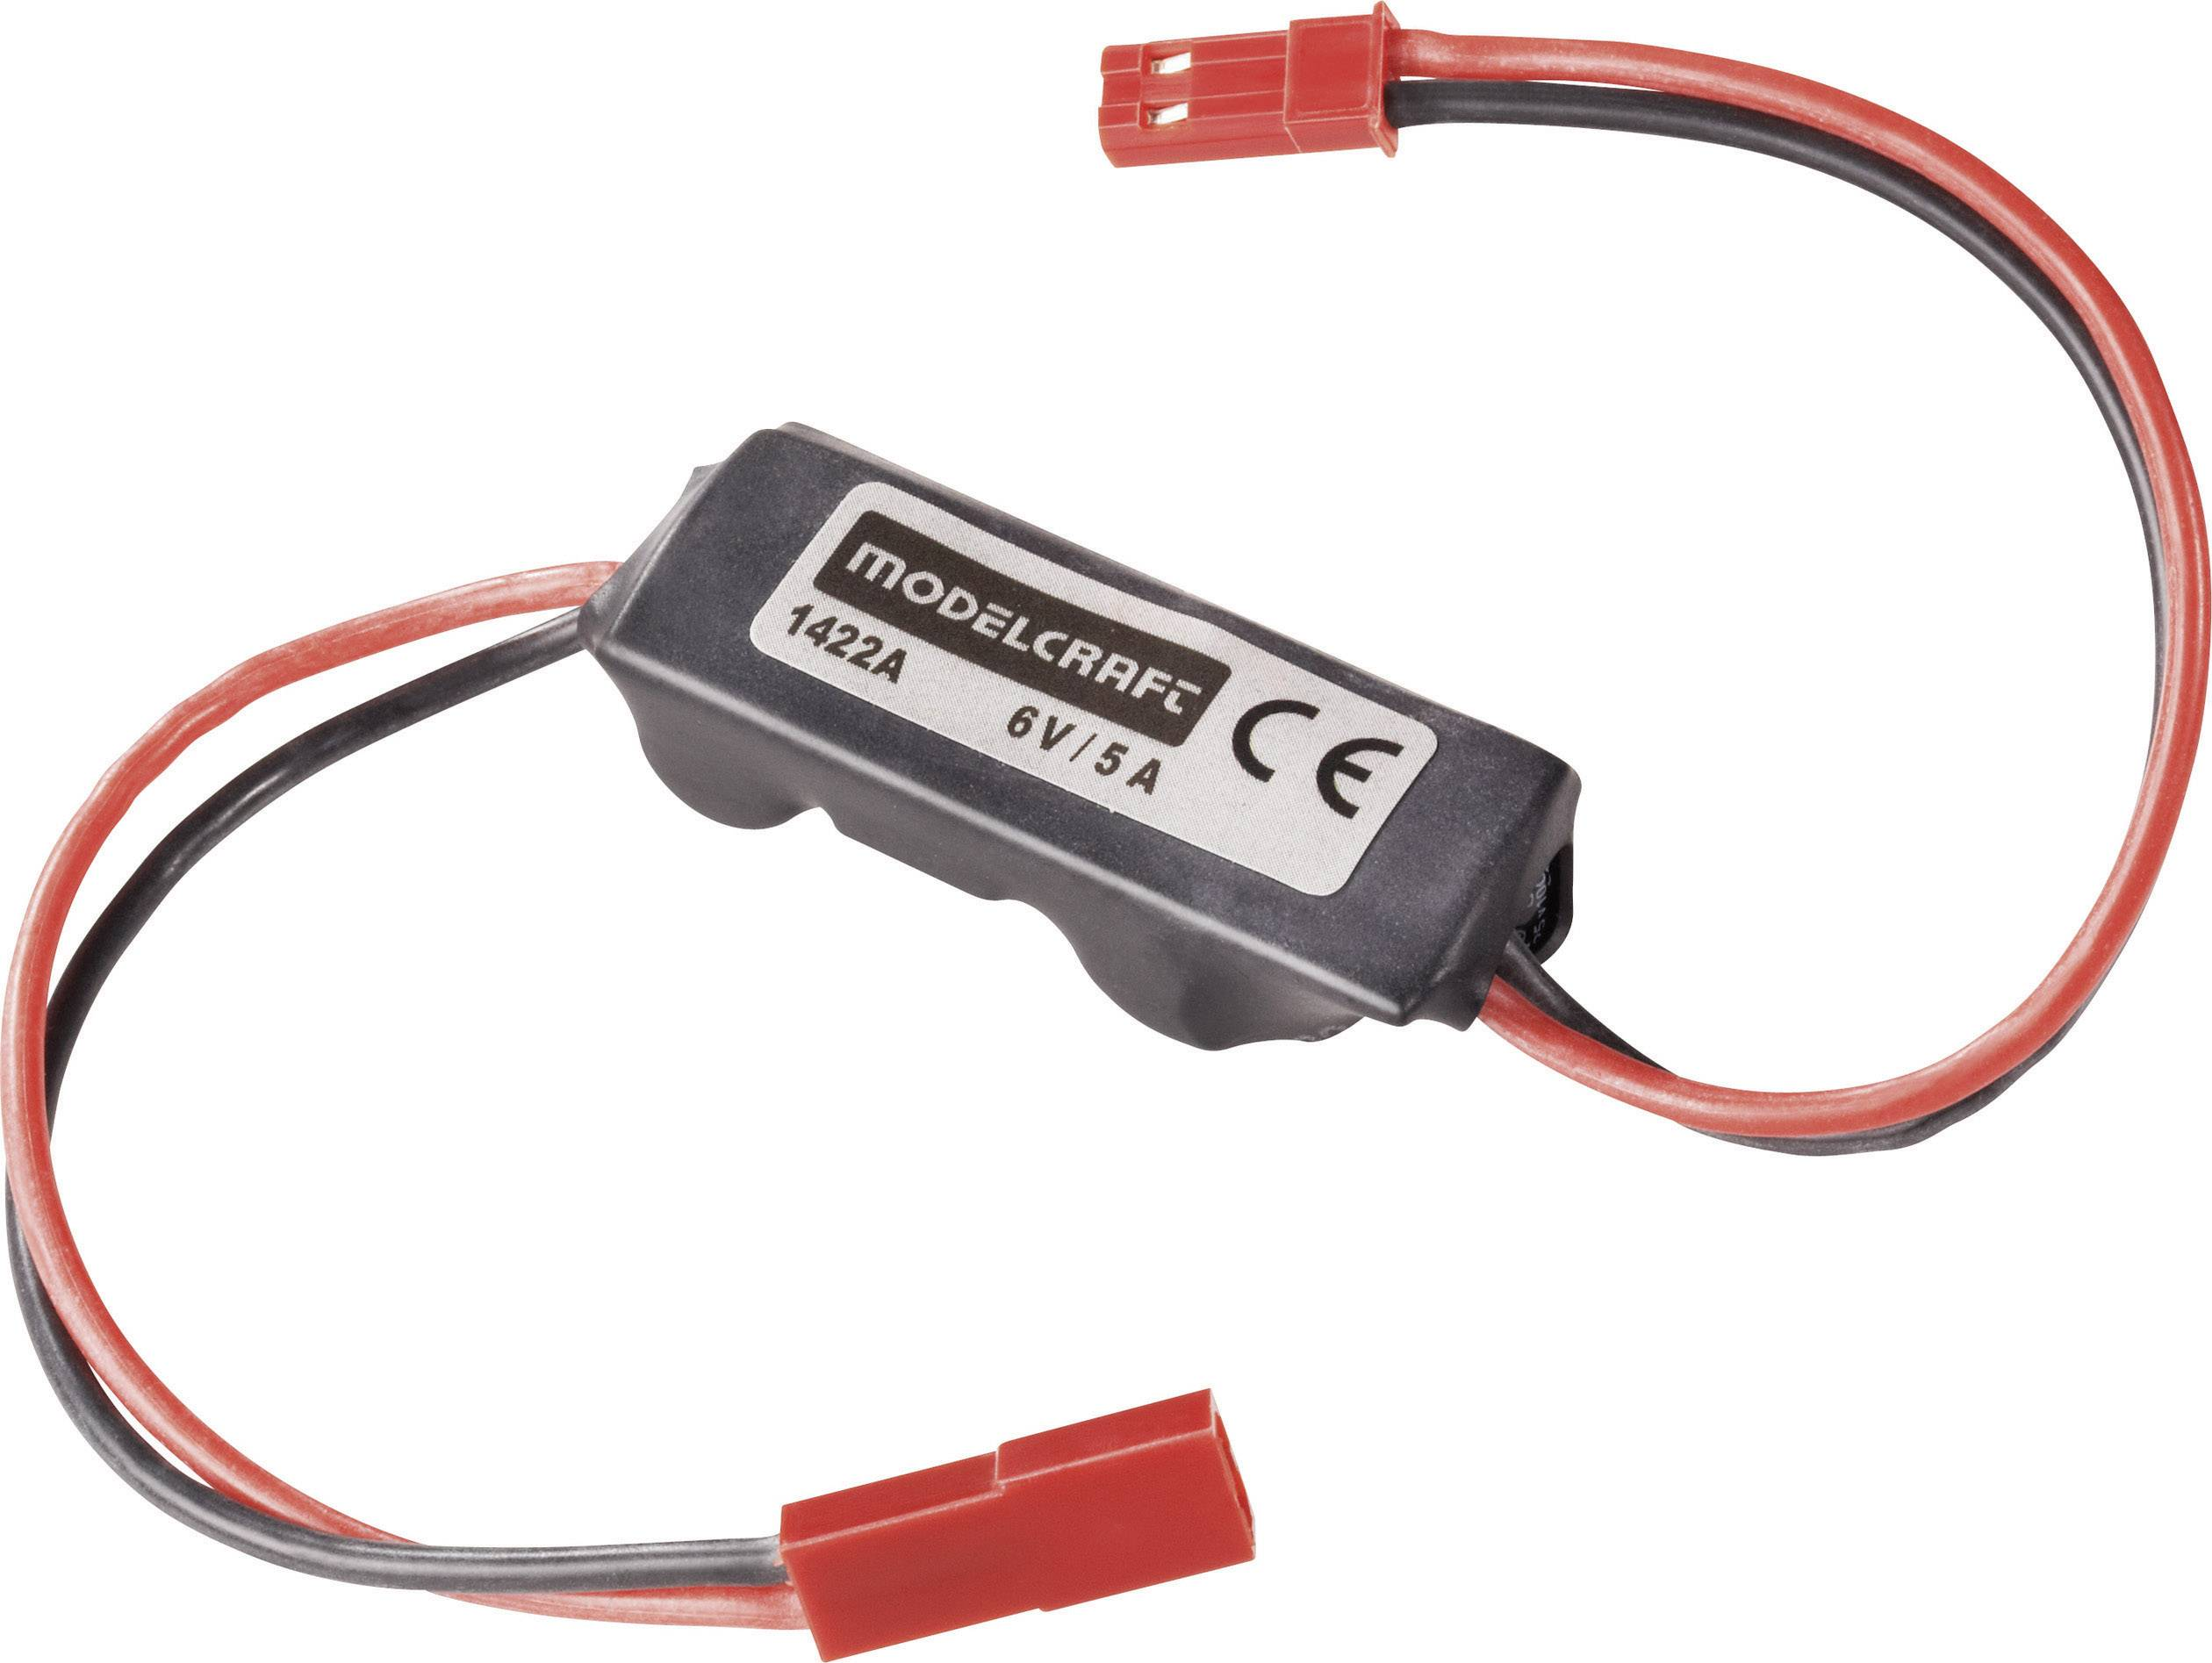 Regulátor napětí Li-Pol Modelcraft, 6 V